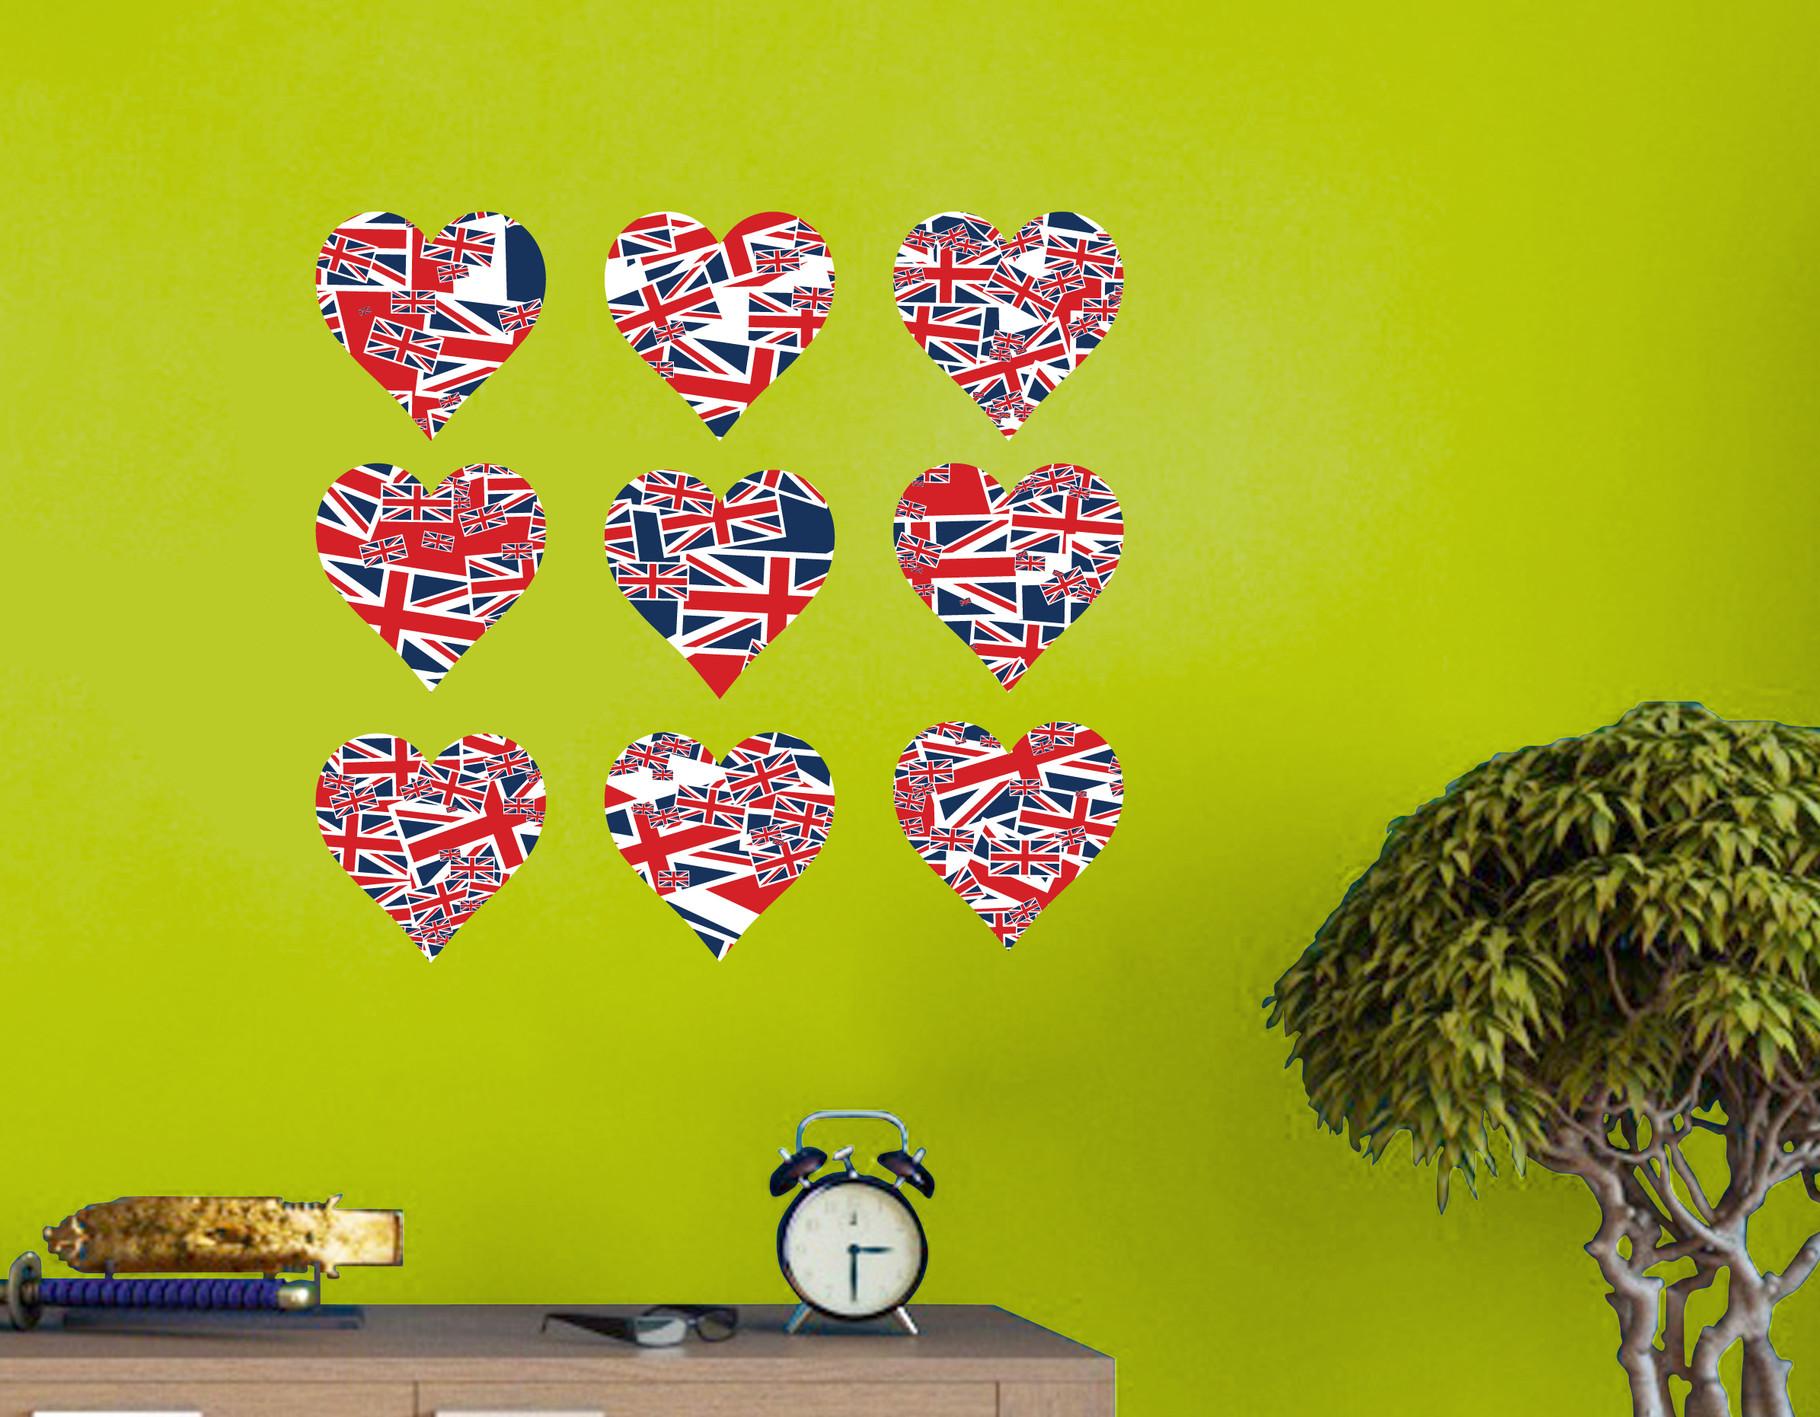 Pimd Wall Art App - Elitflat